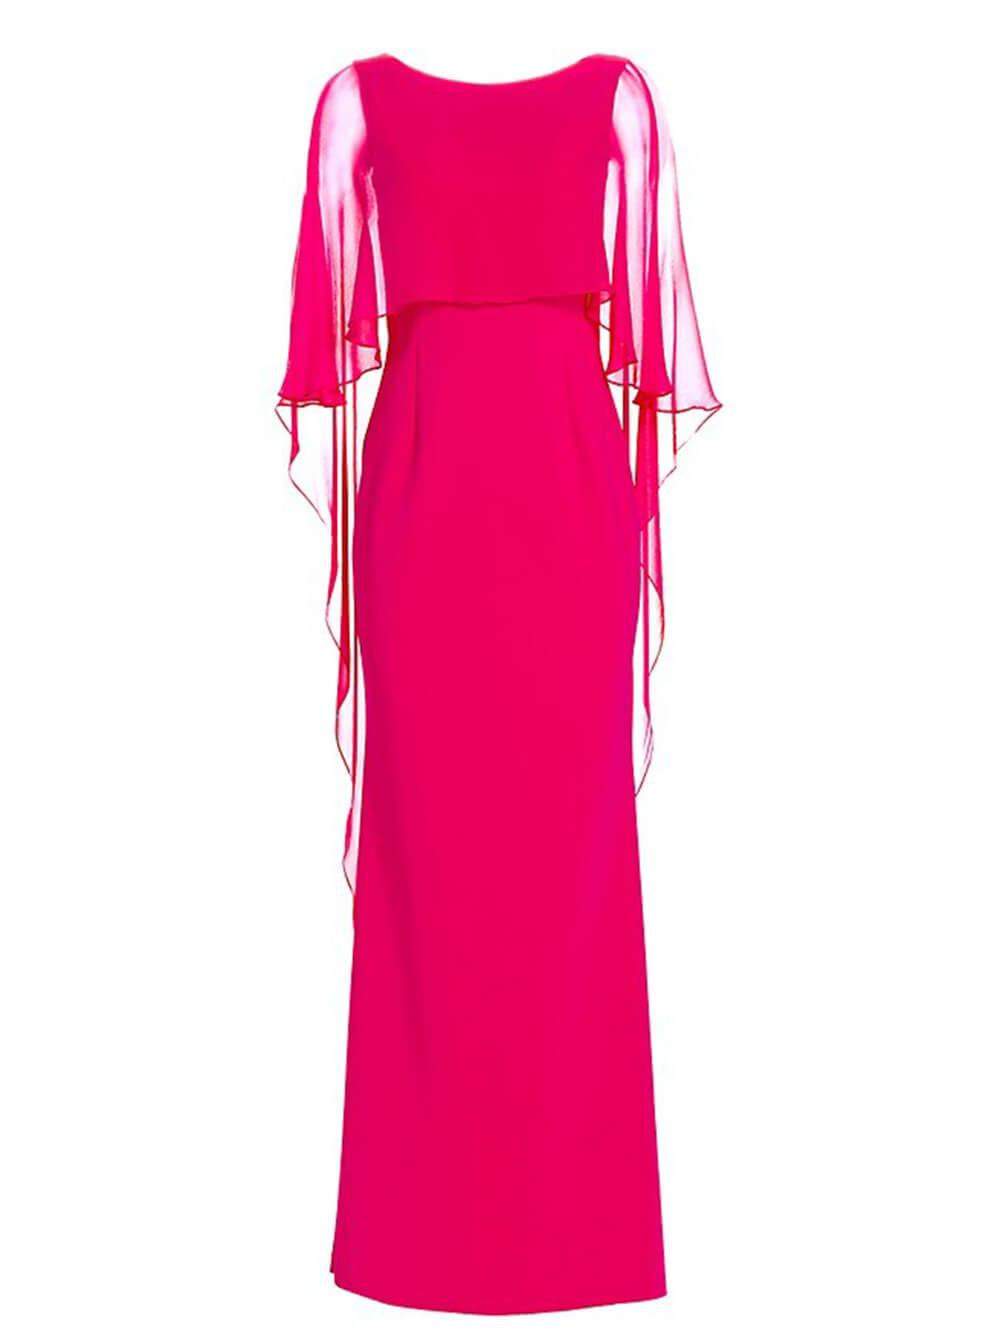 Scuba Dress With Chiffon Overlay Item # 79010-S21